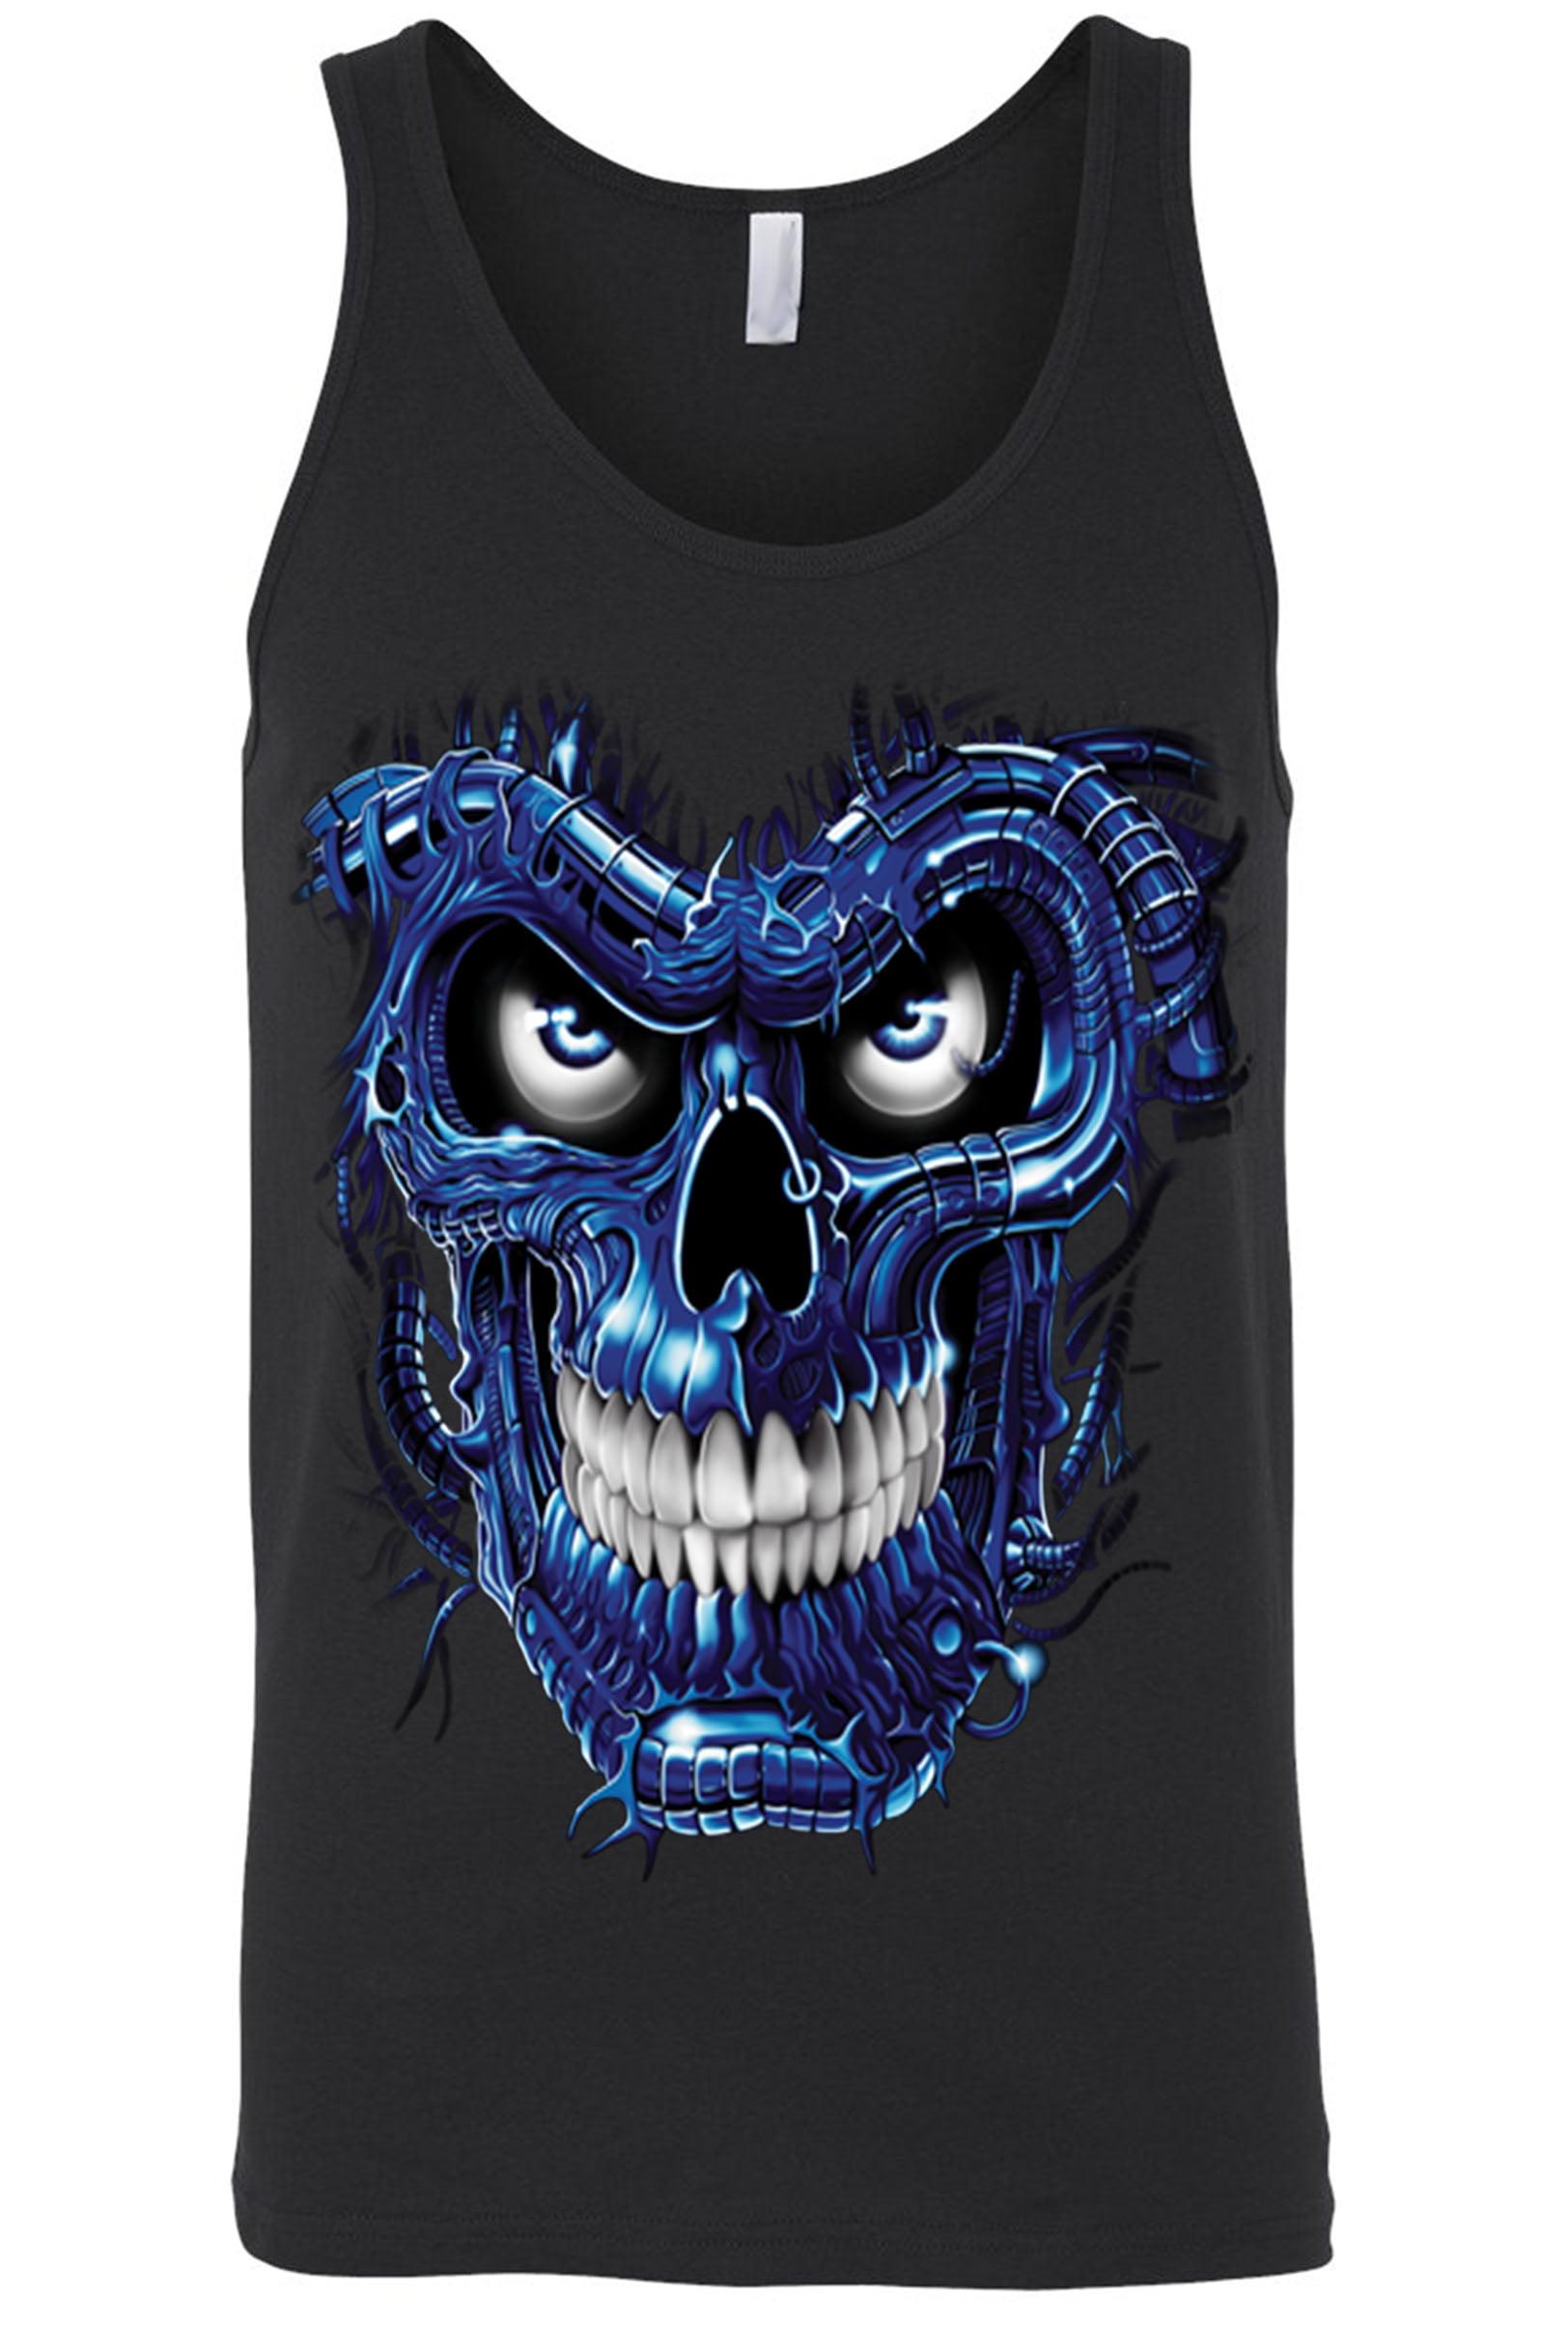 Men's Tank Top Shirt Robotic Skull